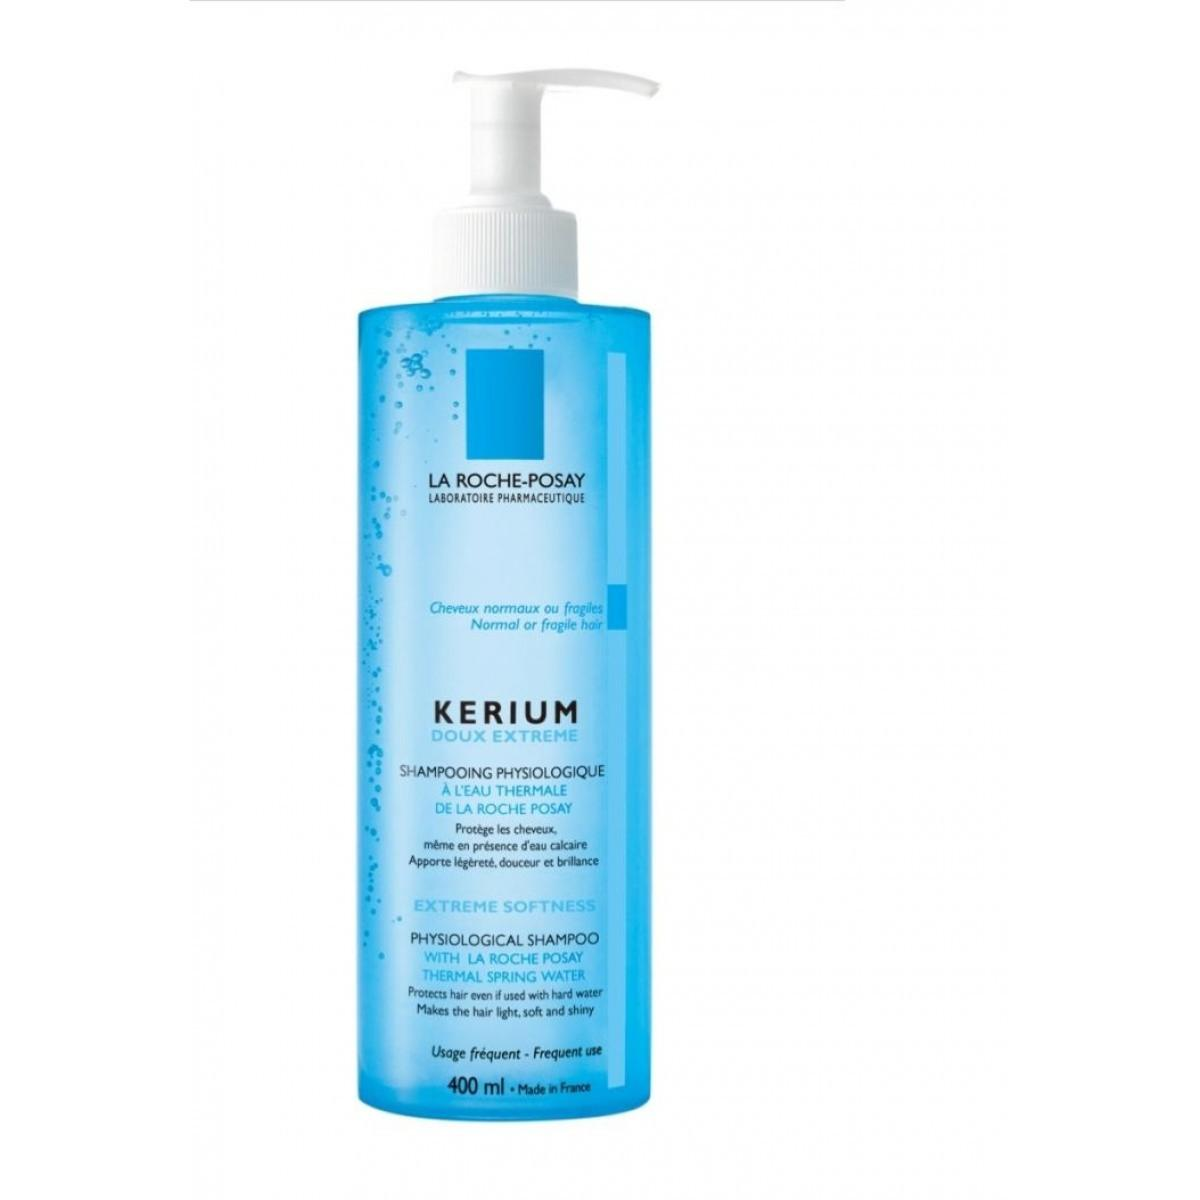 kerium shampooing doux extreme la roche posay. Black Bedroom Furniture Sets. Home Design Ideas